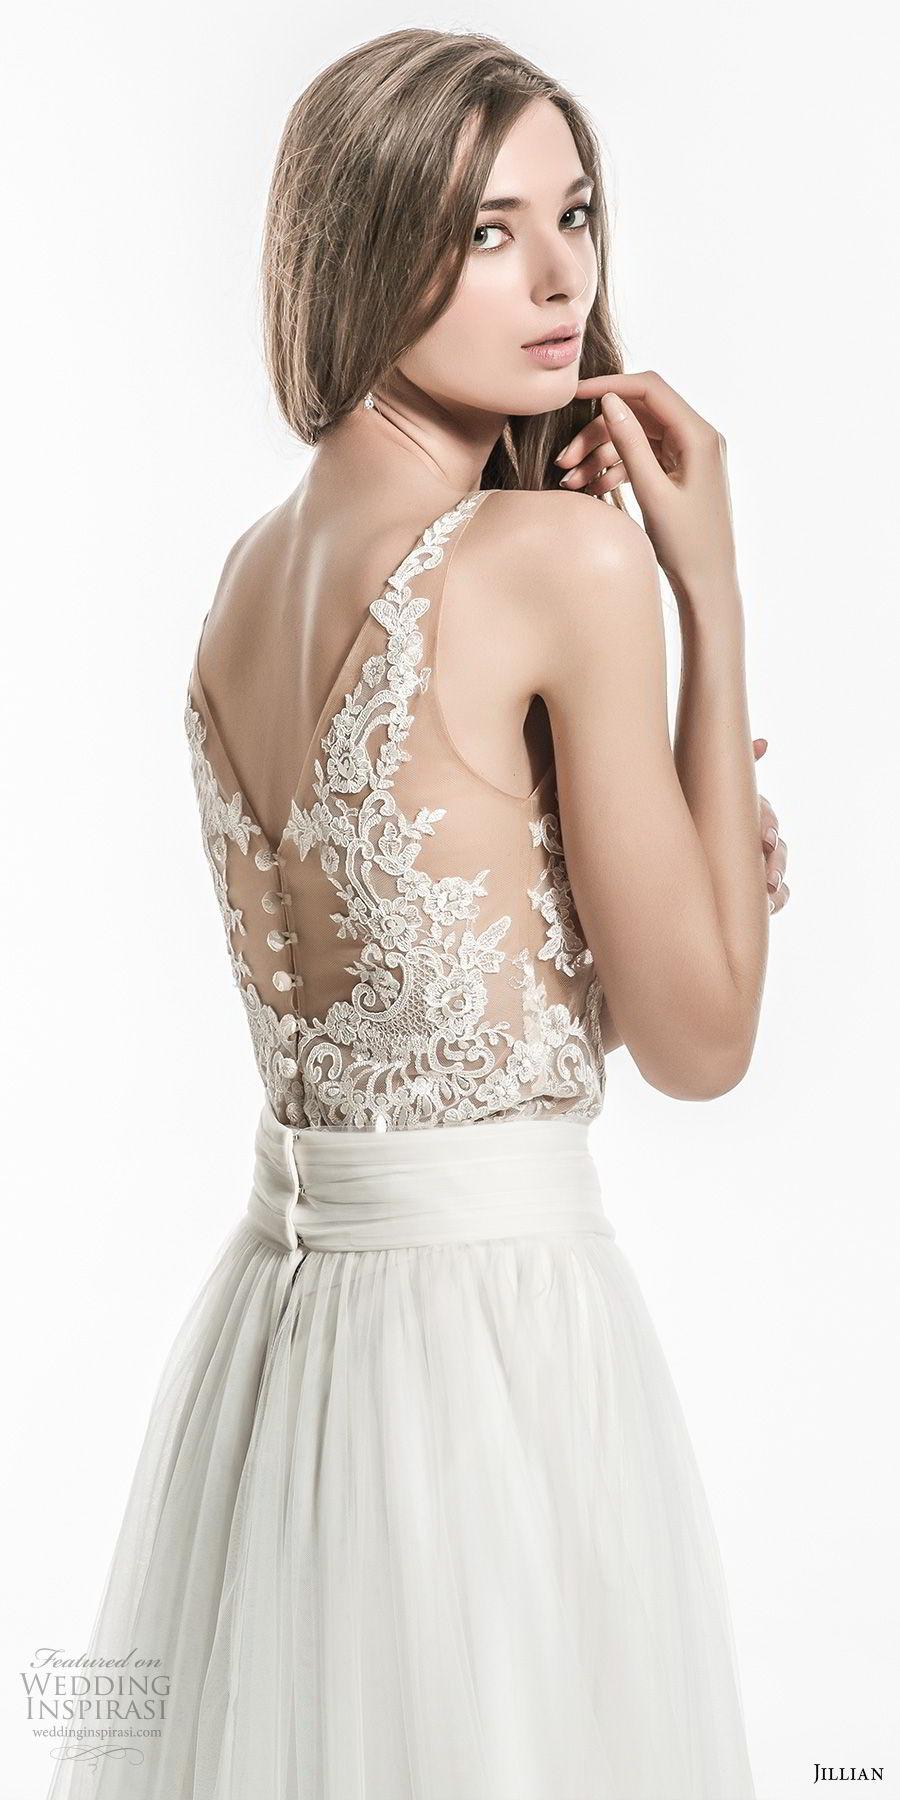 jillian 2018 bridal sleeveless illusion jewel neckline heavily embellished lace bodice flowy skirt elegant a  line wedding dress v lace back sweep train (26) zbv